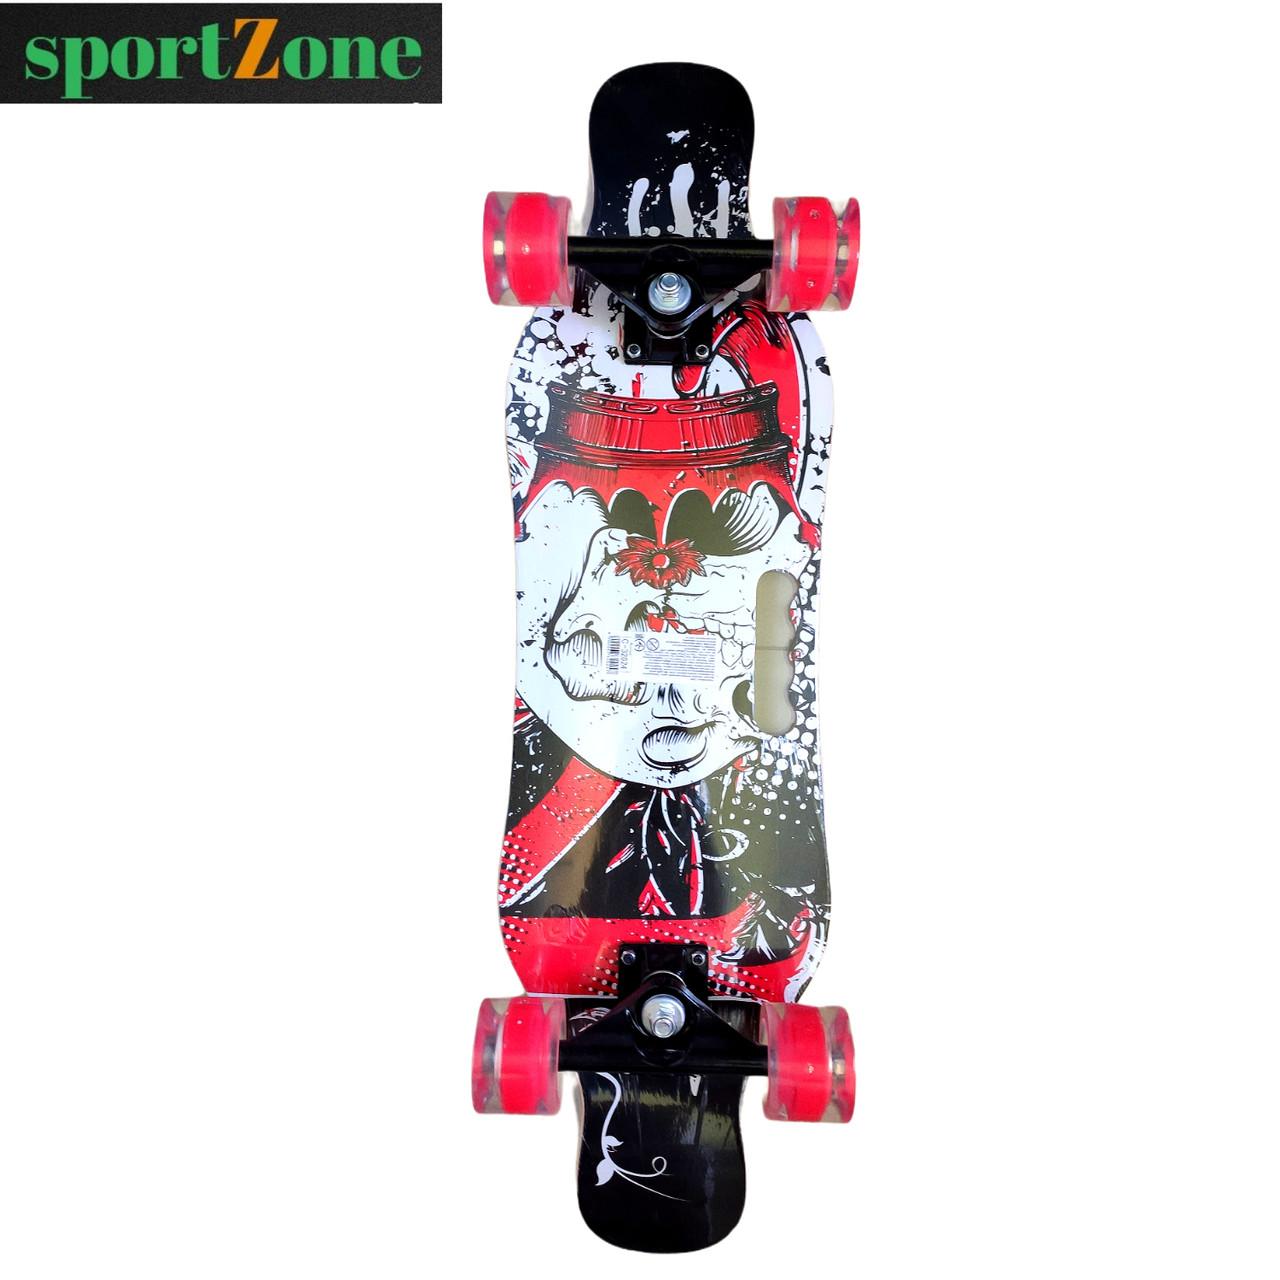 Скейт (скейтборд) 32024, подшипник АВЕС-9, колёса светящиеся PU, d=6 см, 6 слоев канадского клена